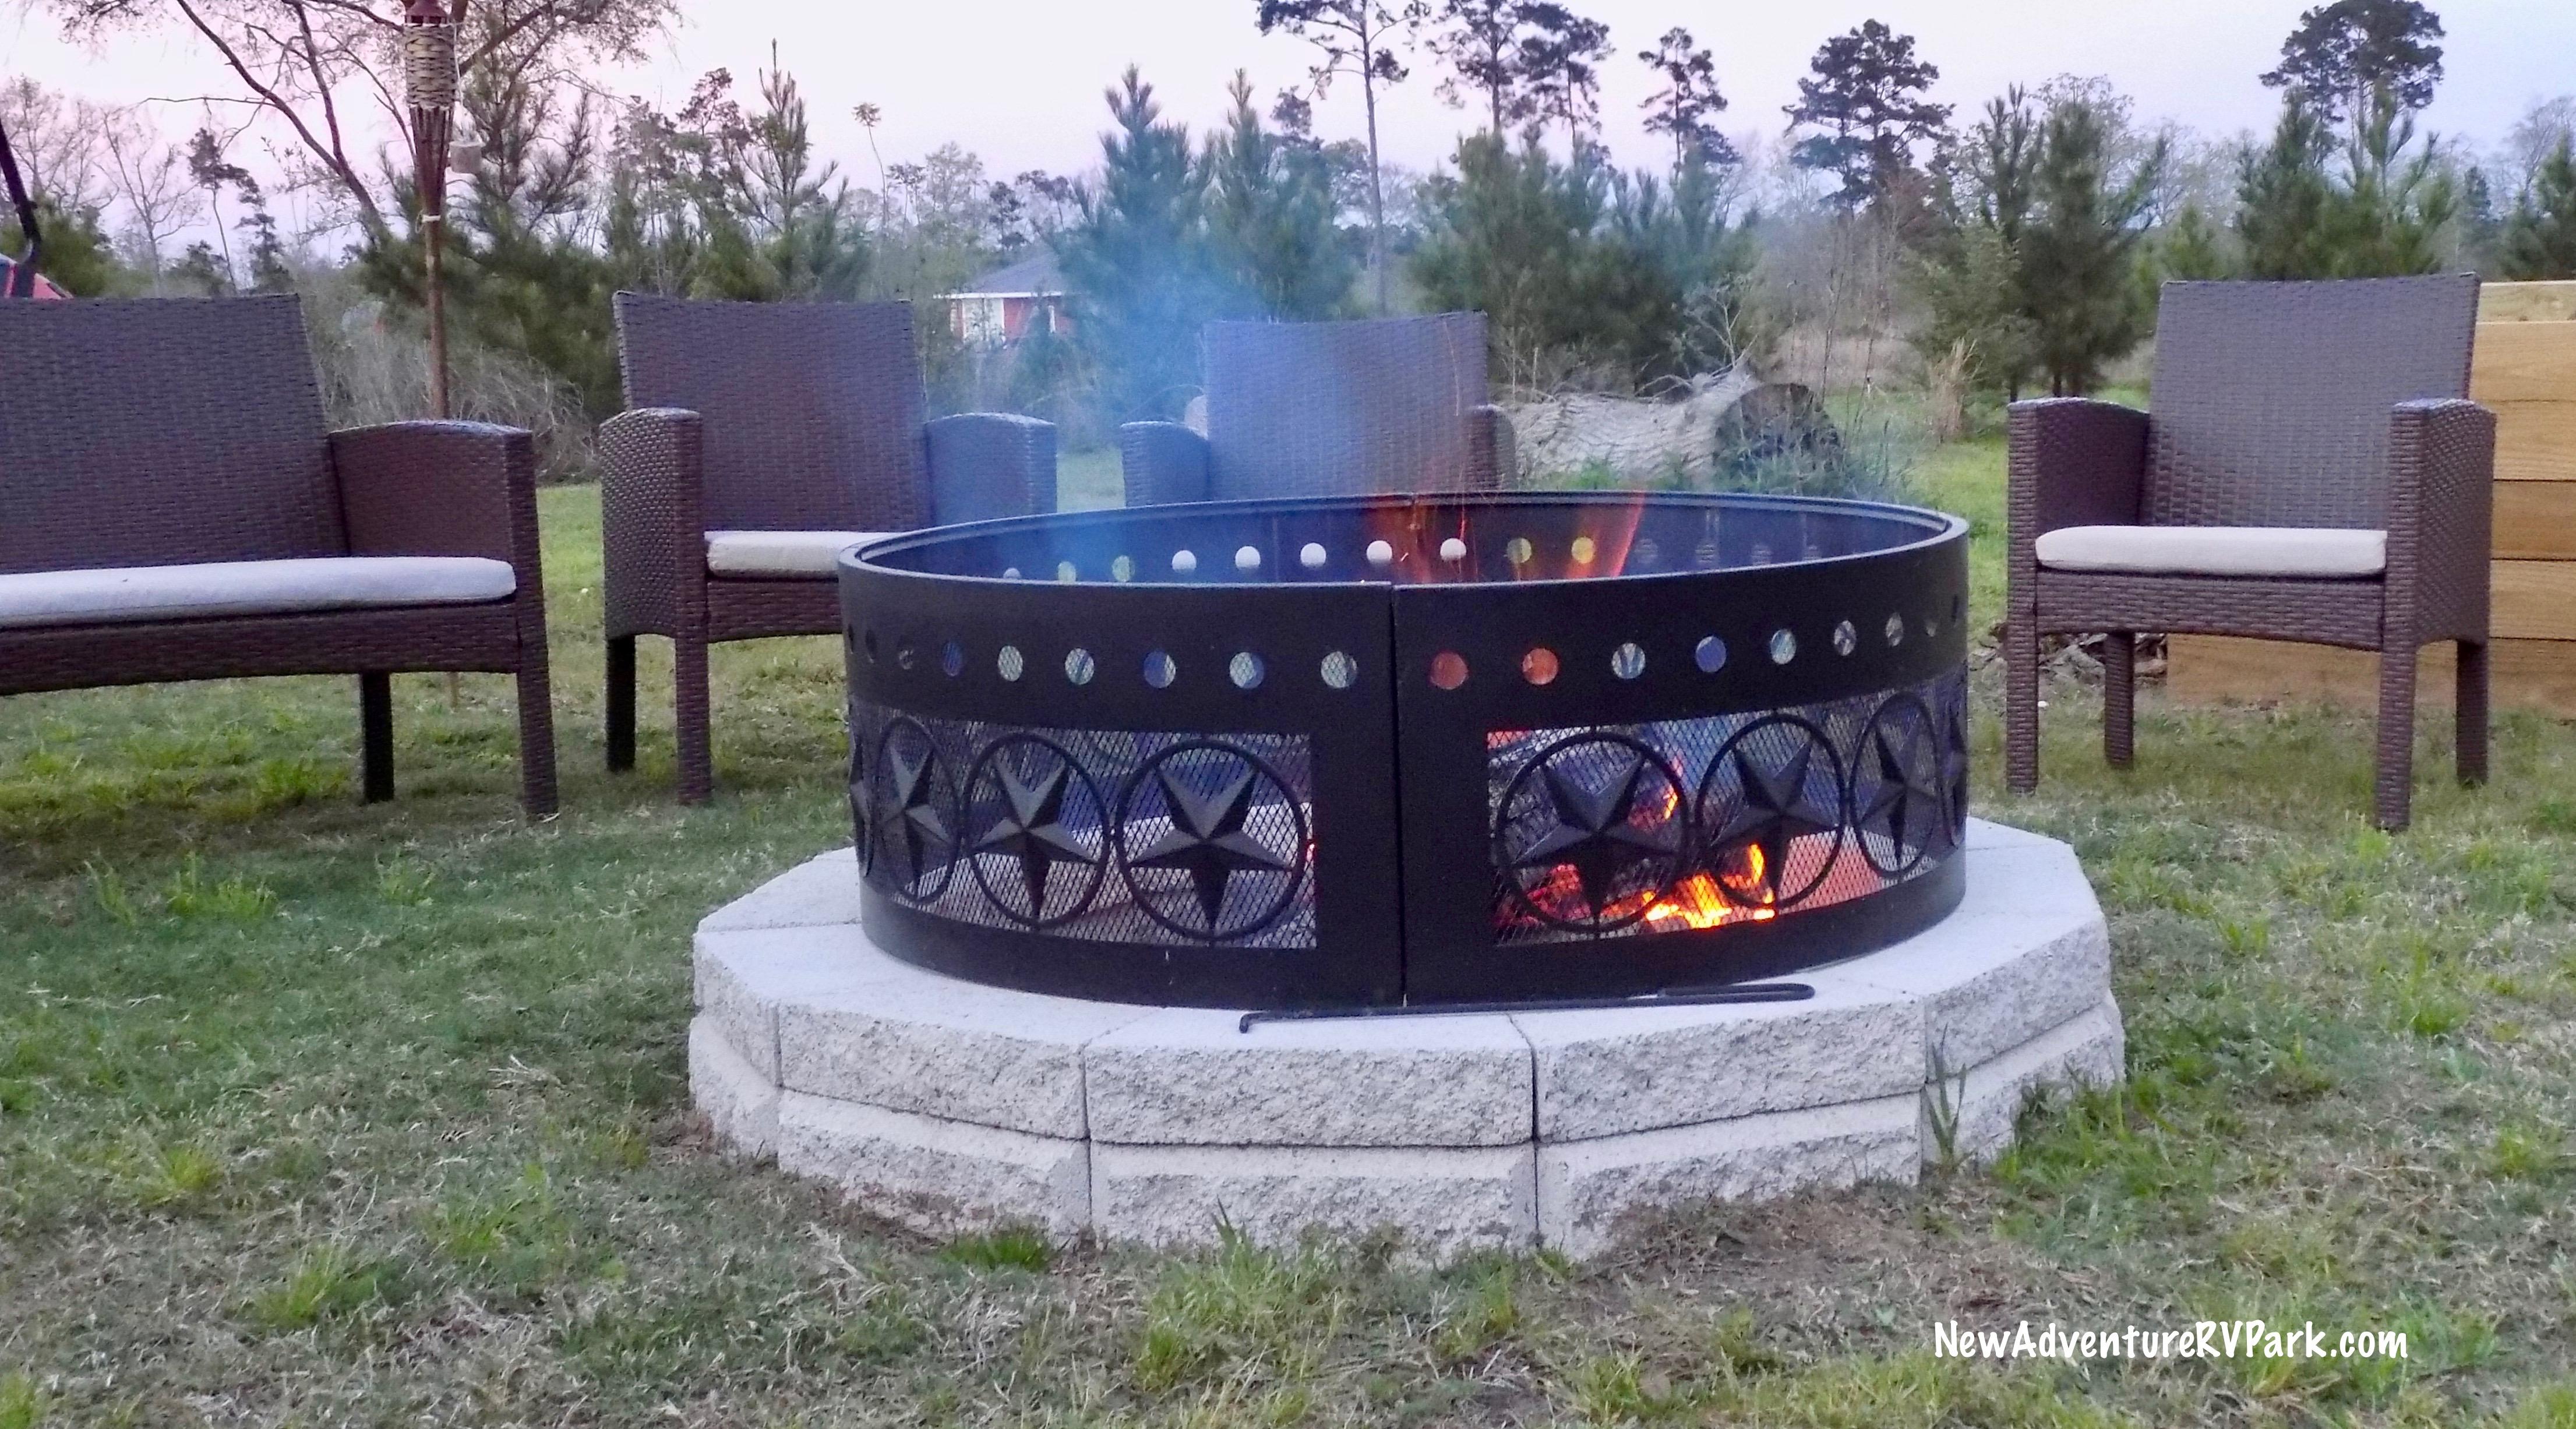 Campfire at New Adventure RV